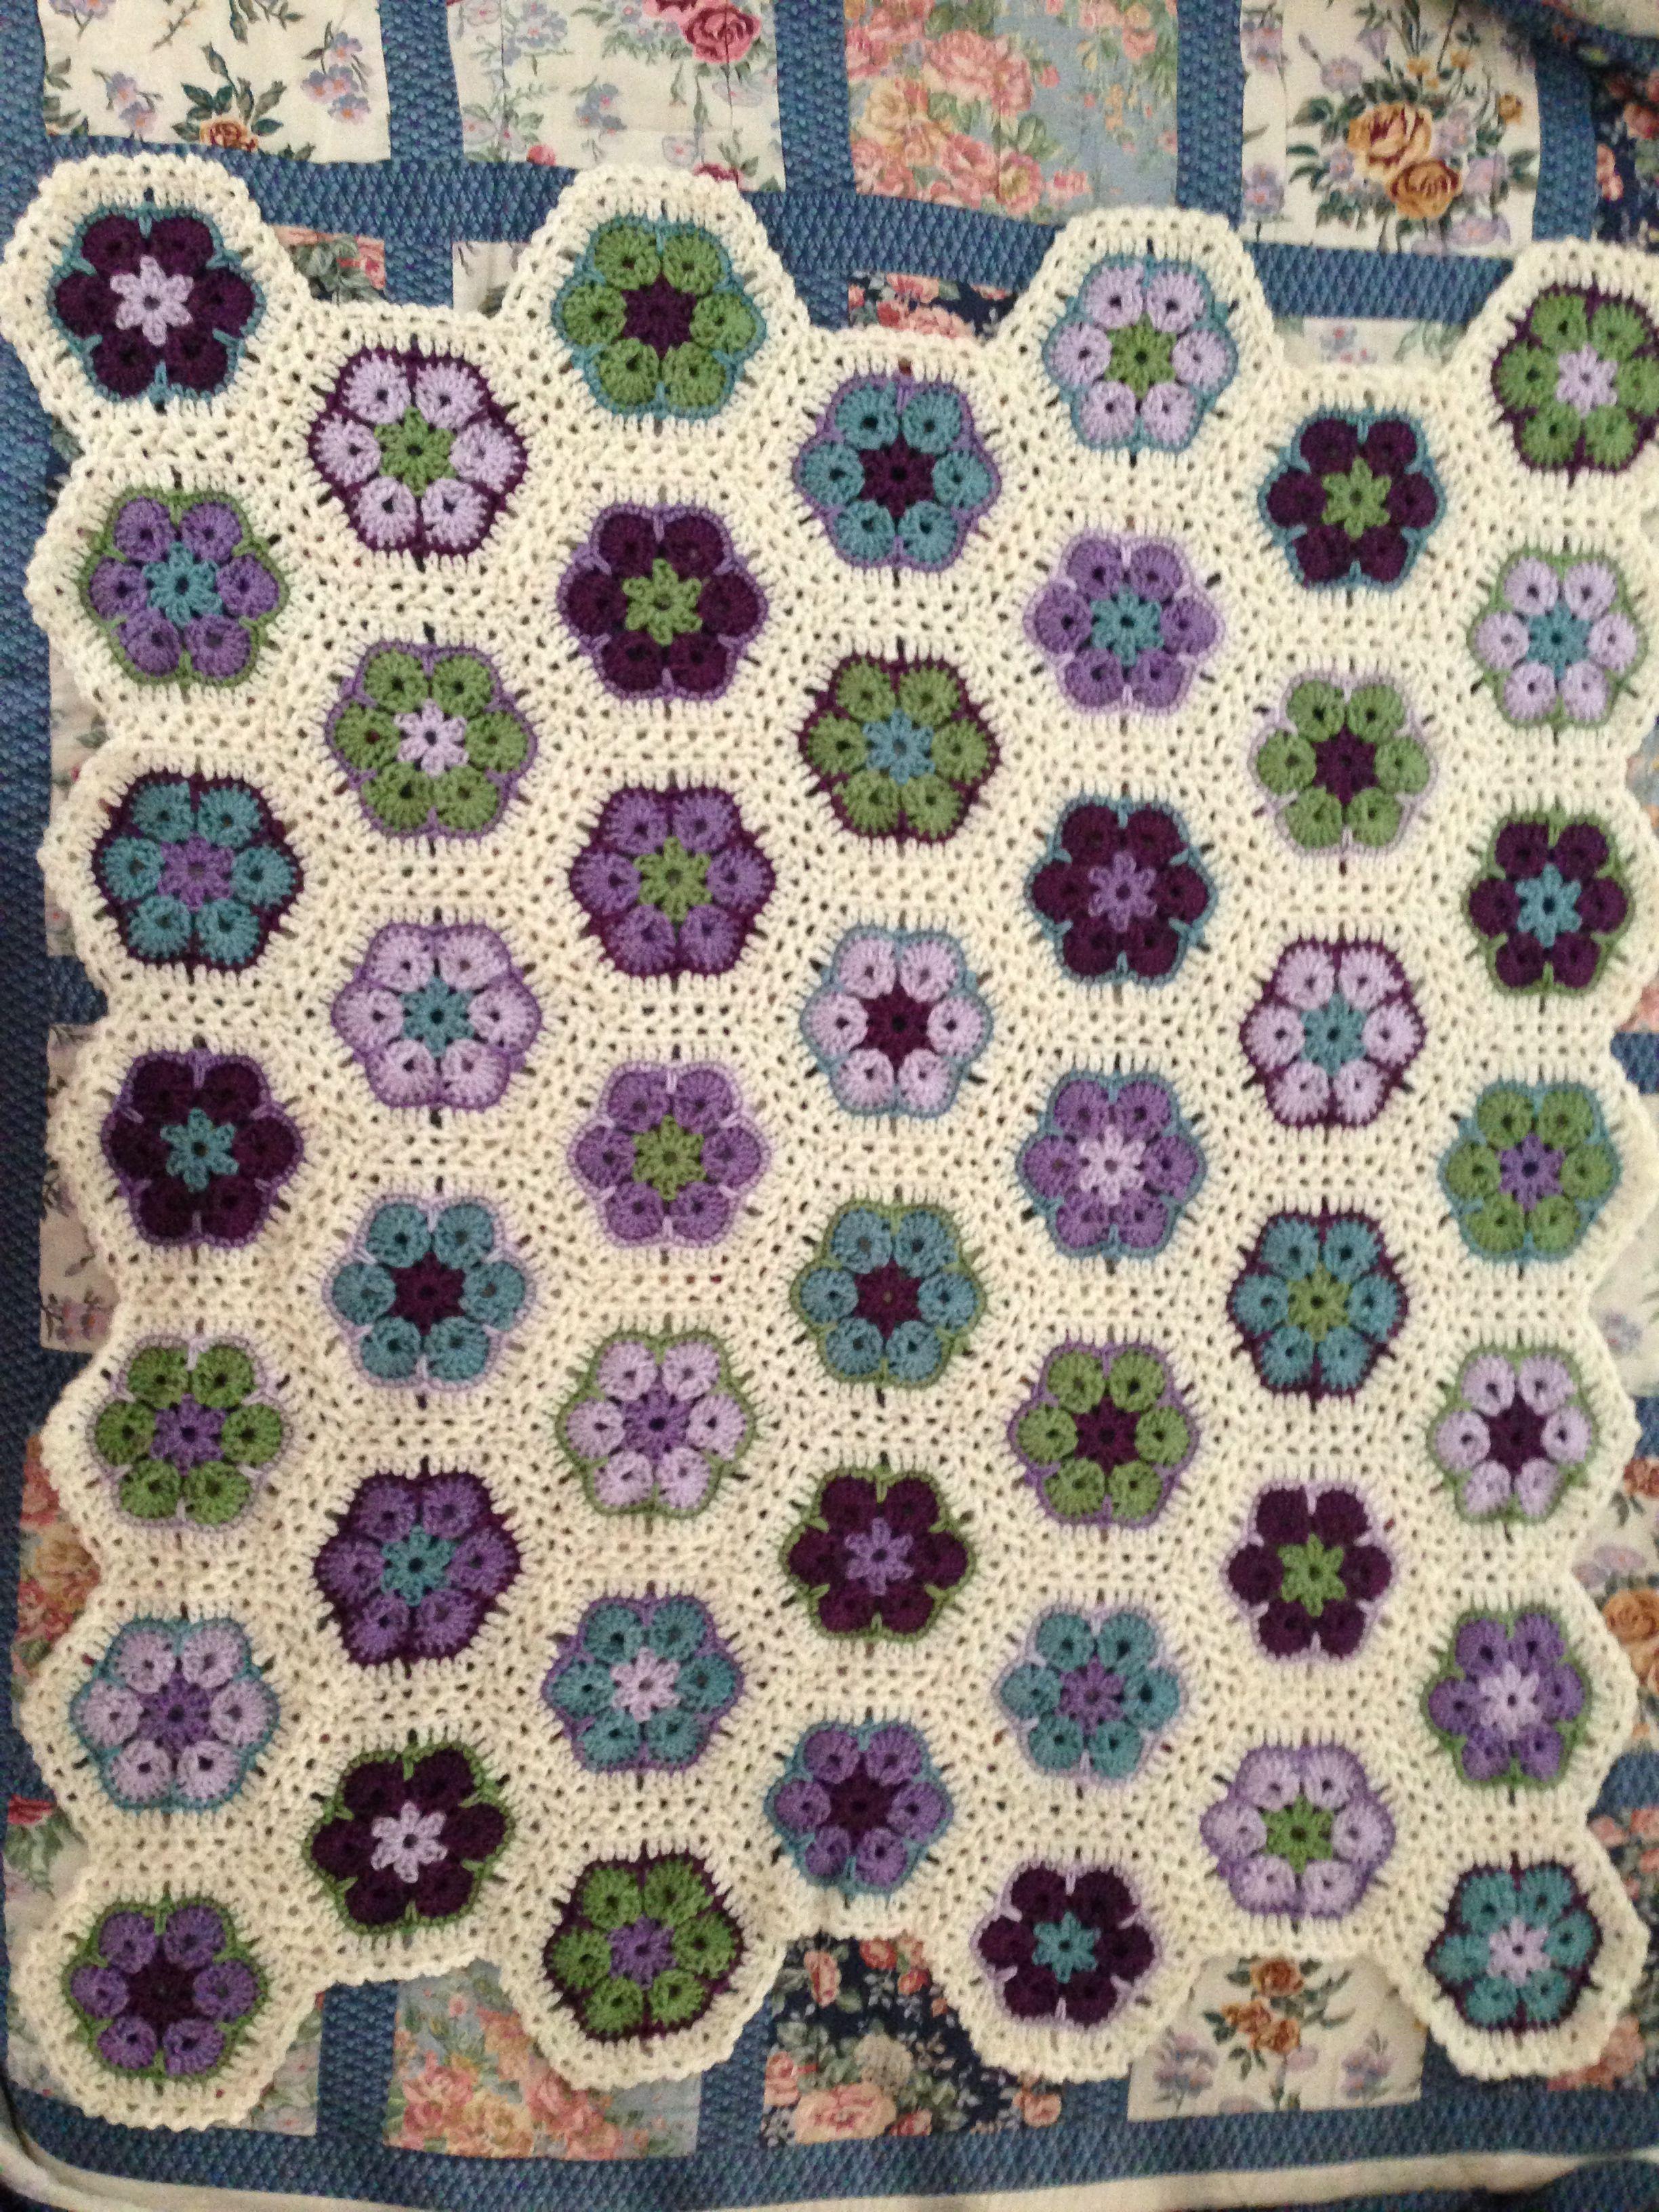 African Flower Crochet Baby Blanket Pattern : African flower crochet baby blanket pattern